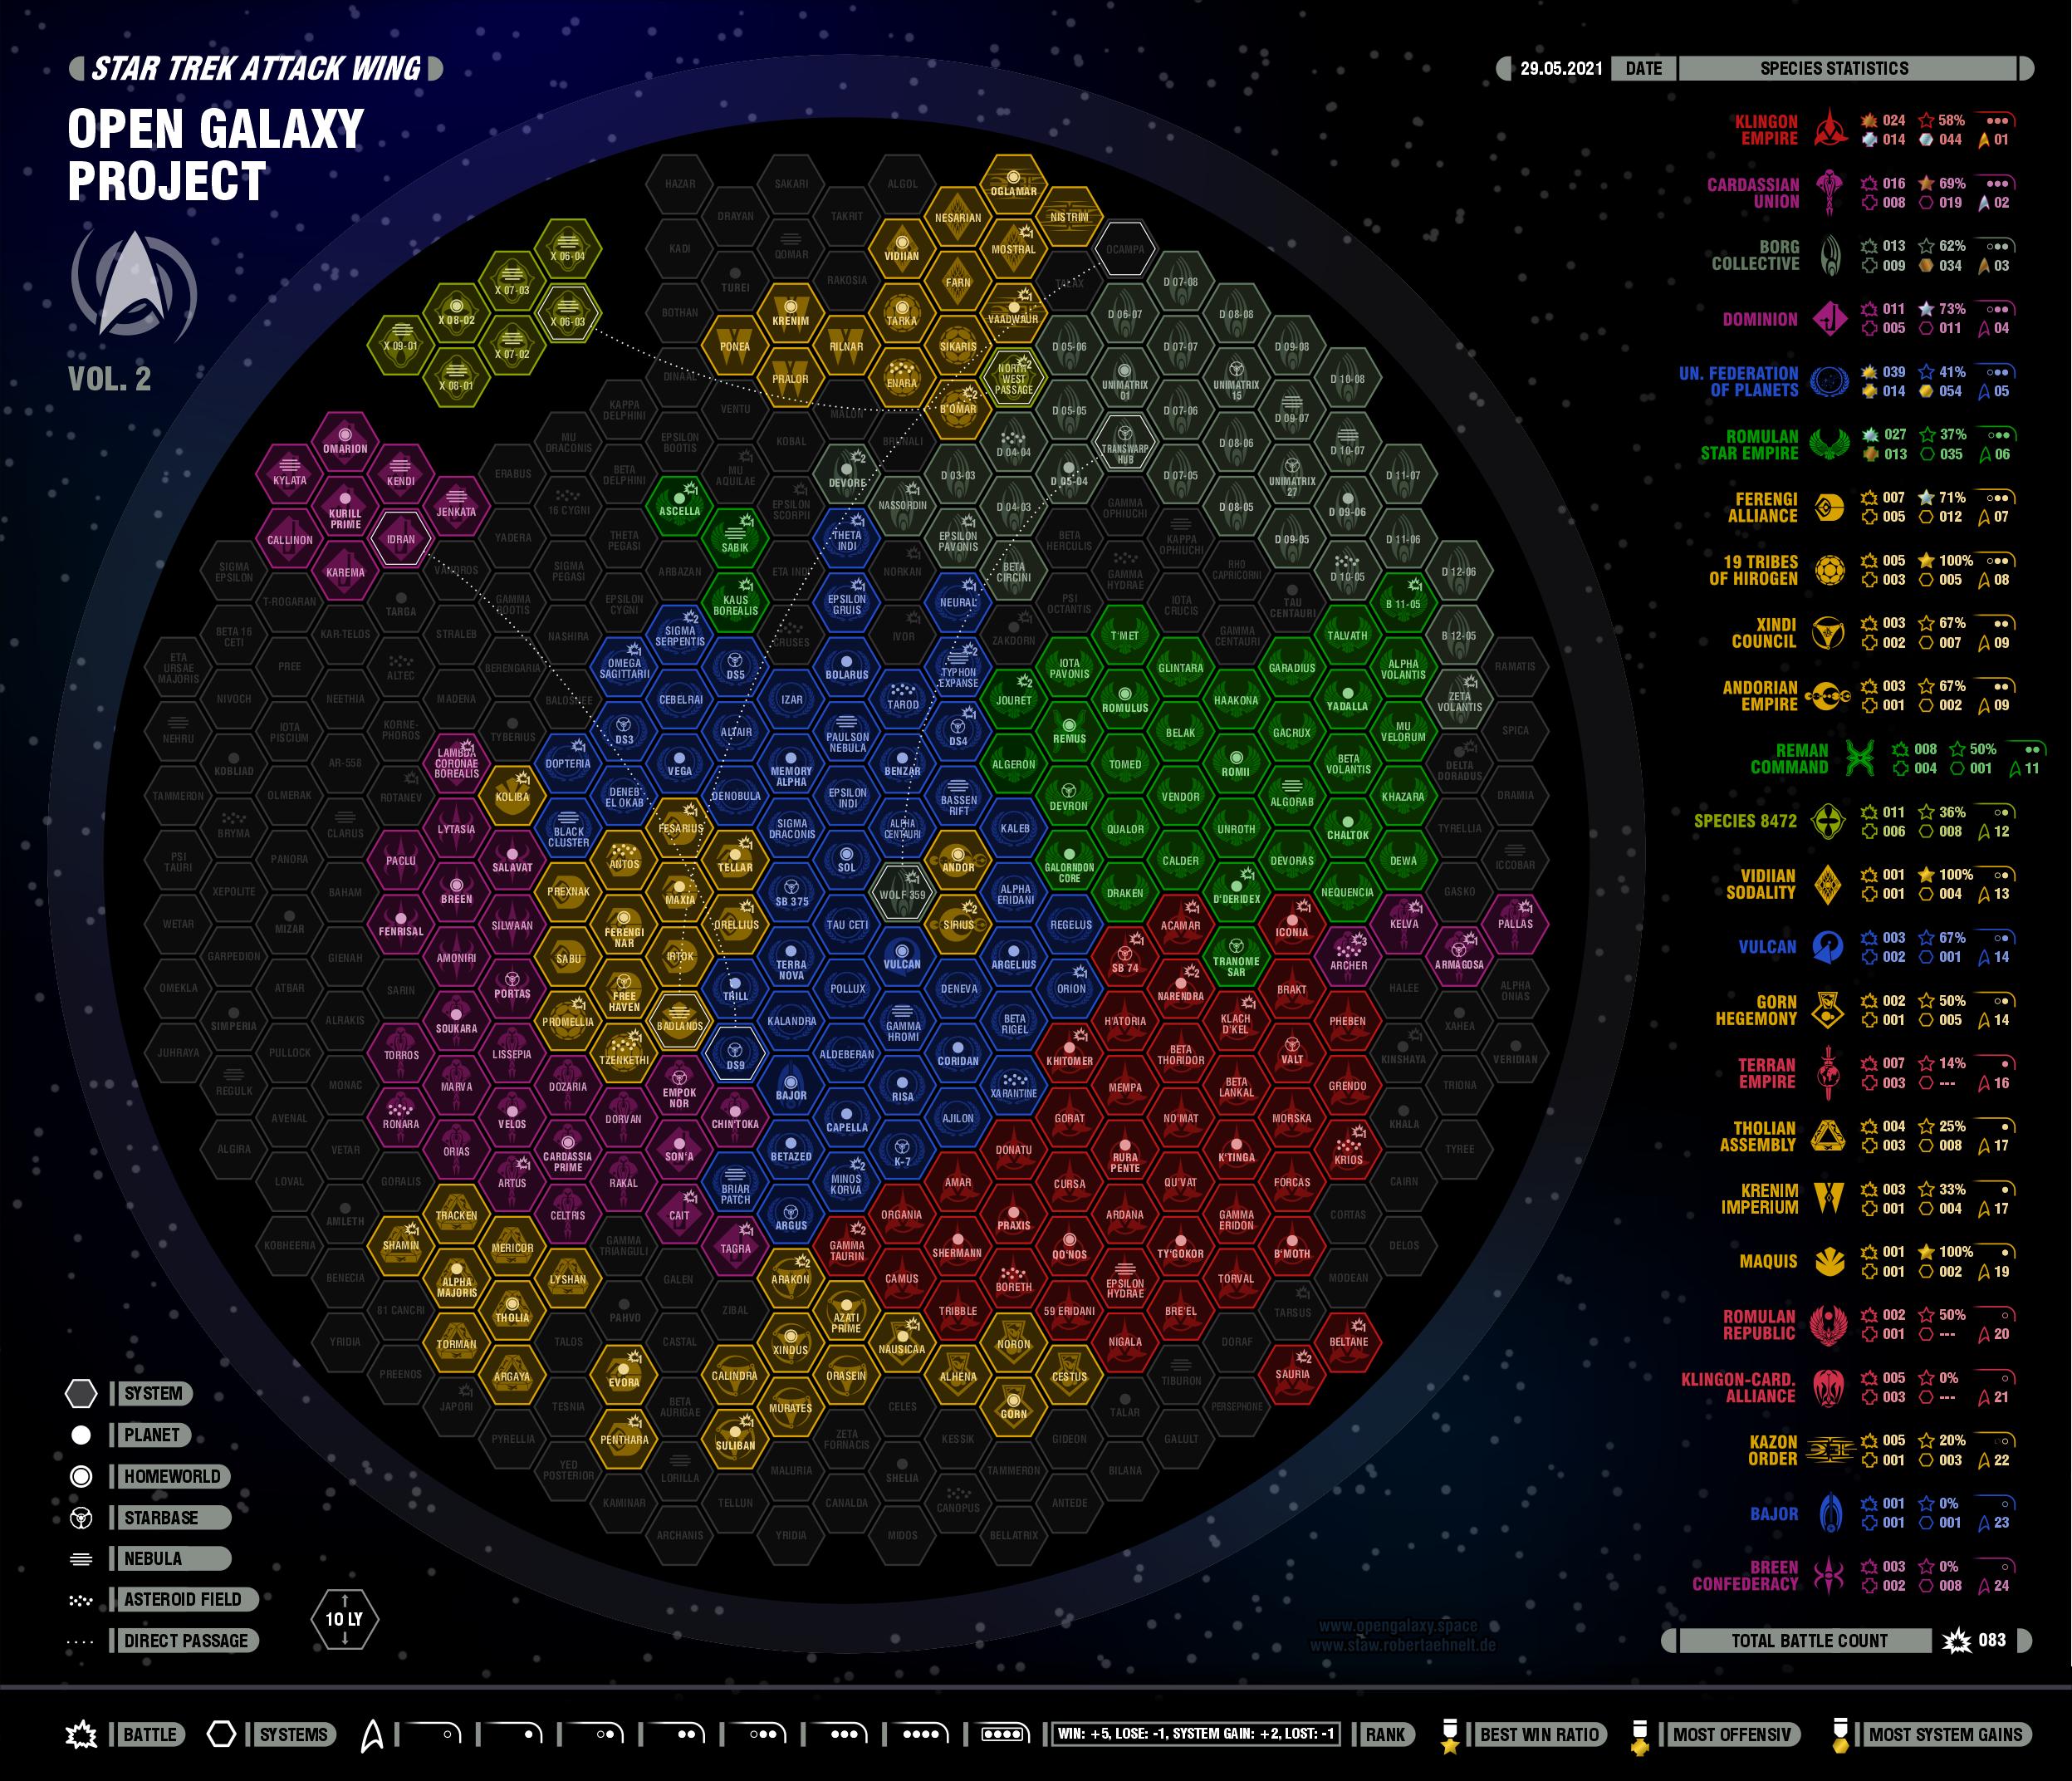 Open Galaxy Project Vol. 2 STAW_OpenGalaxyMap2_083